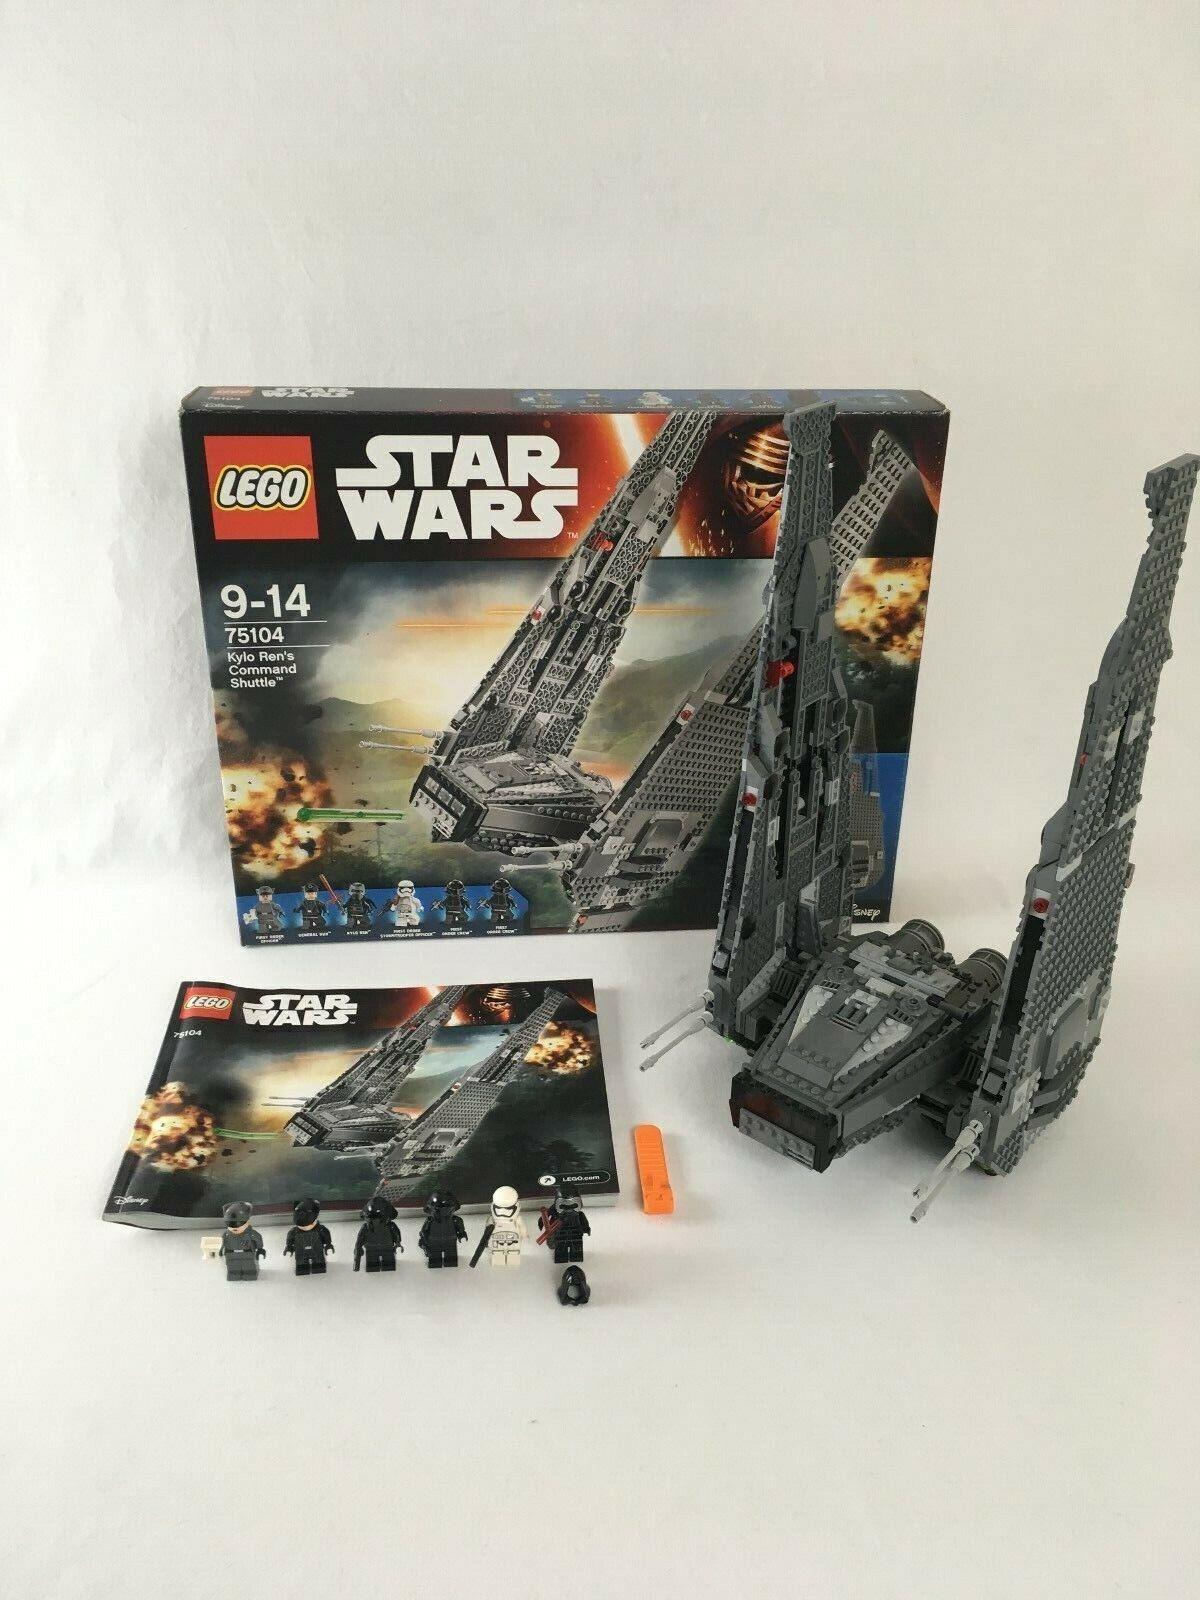 LEGO ® Star Wars 75104 Kylo REN's Command Shuttle